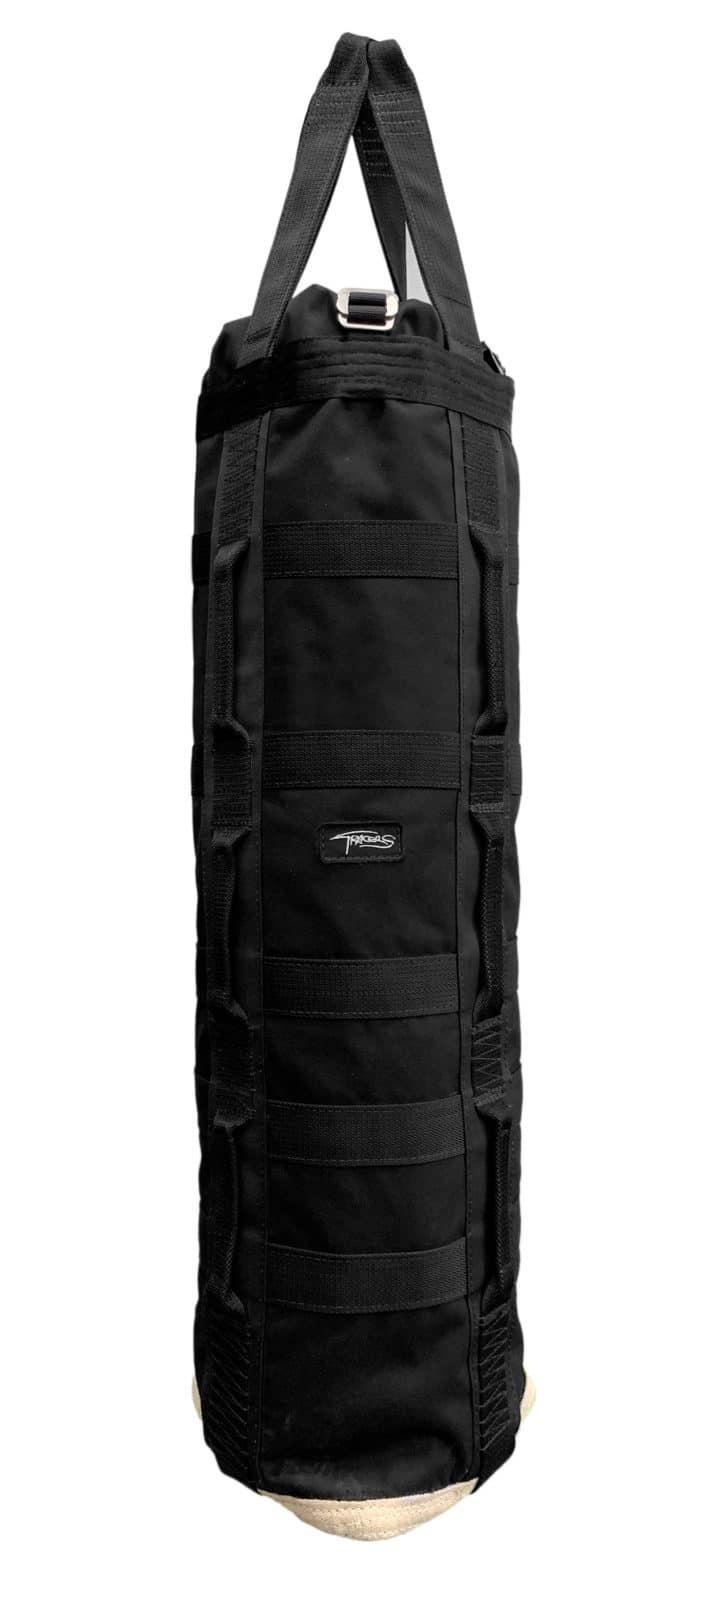 Drop test bag, counterweight, sandbag dummy, stunt rigging